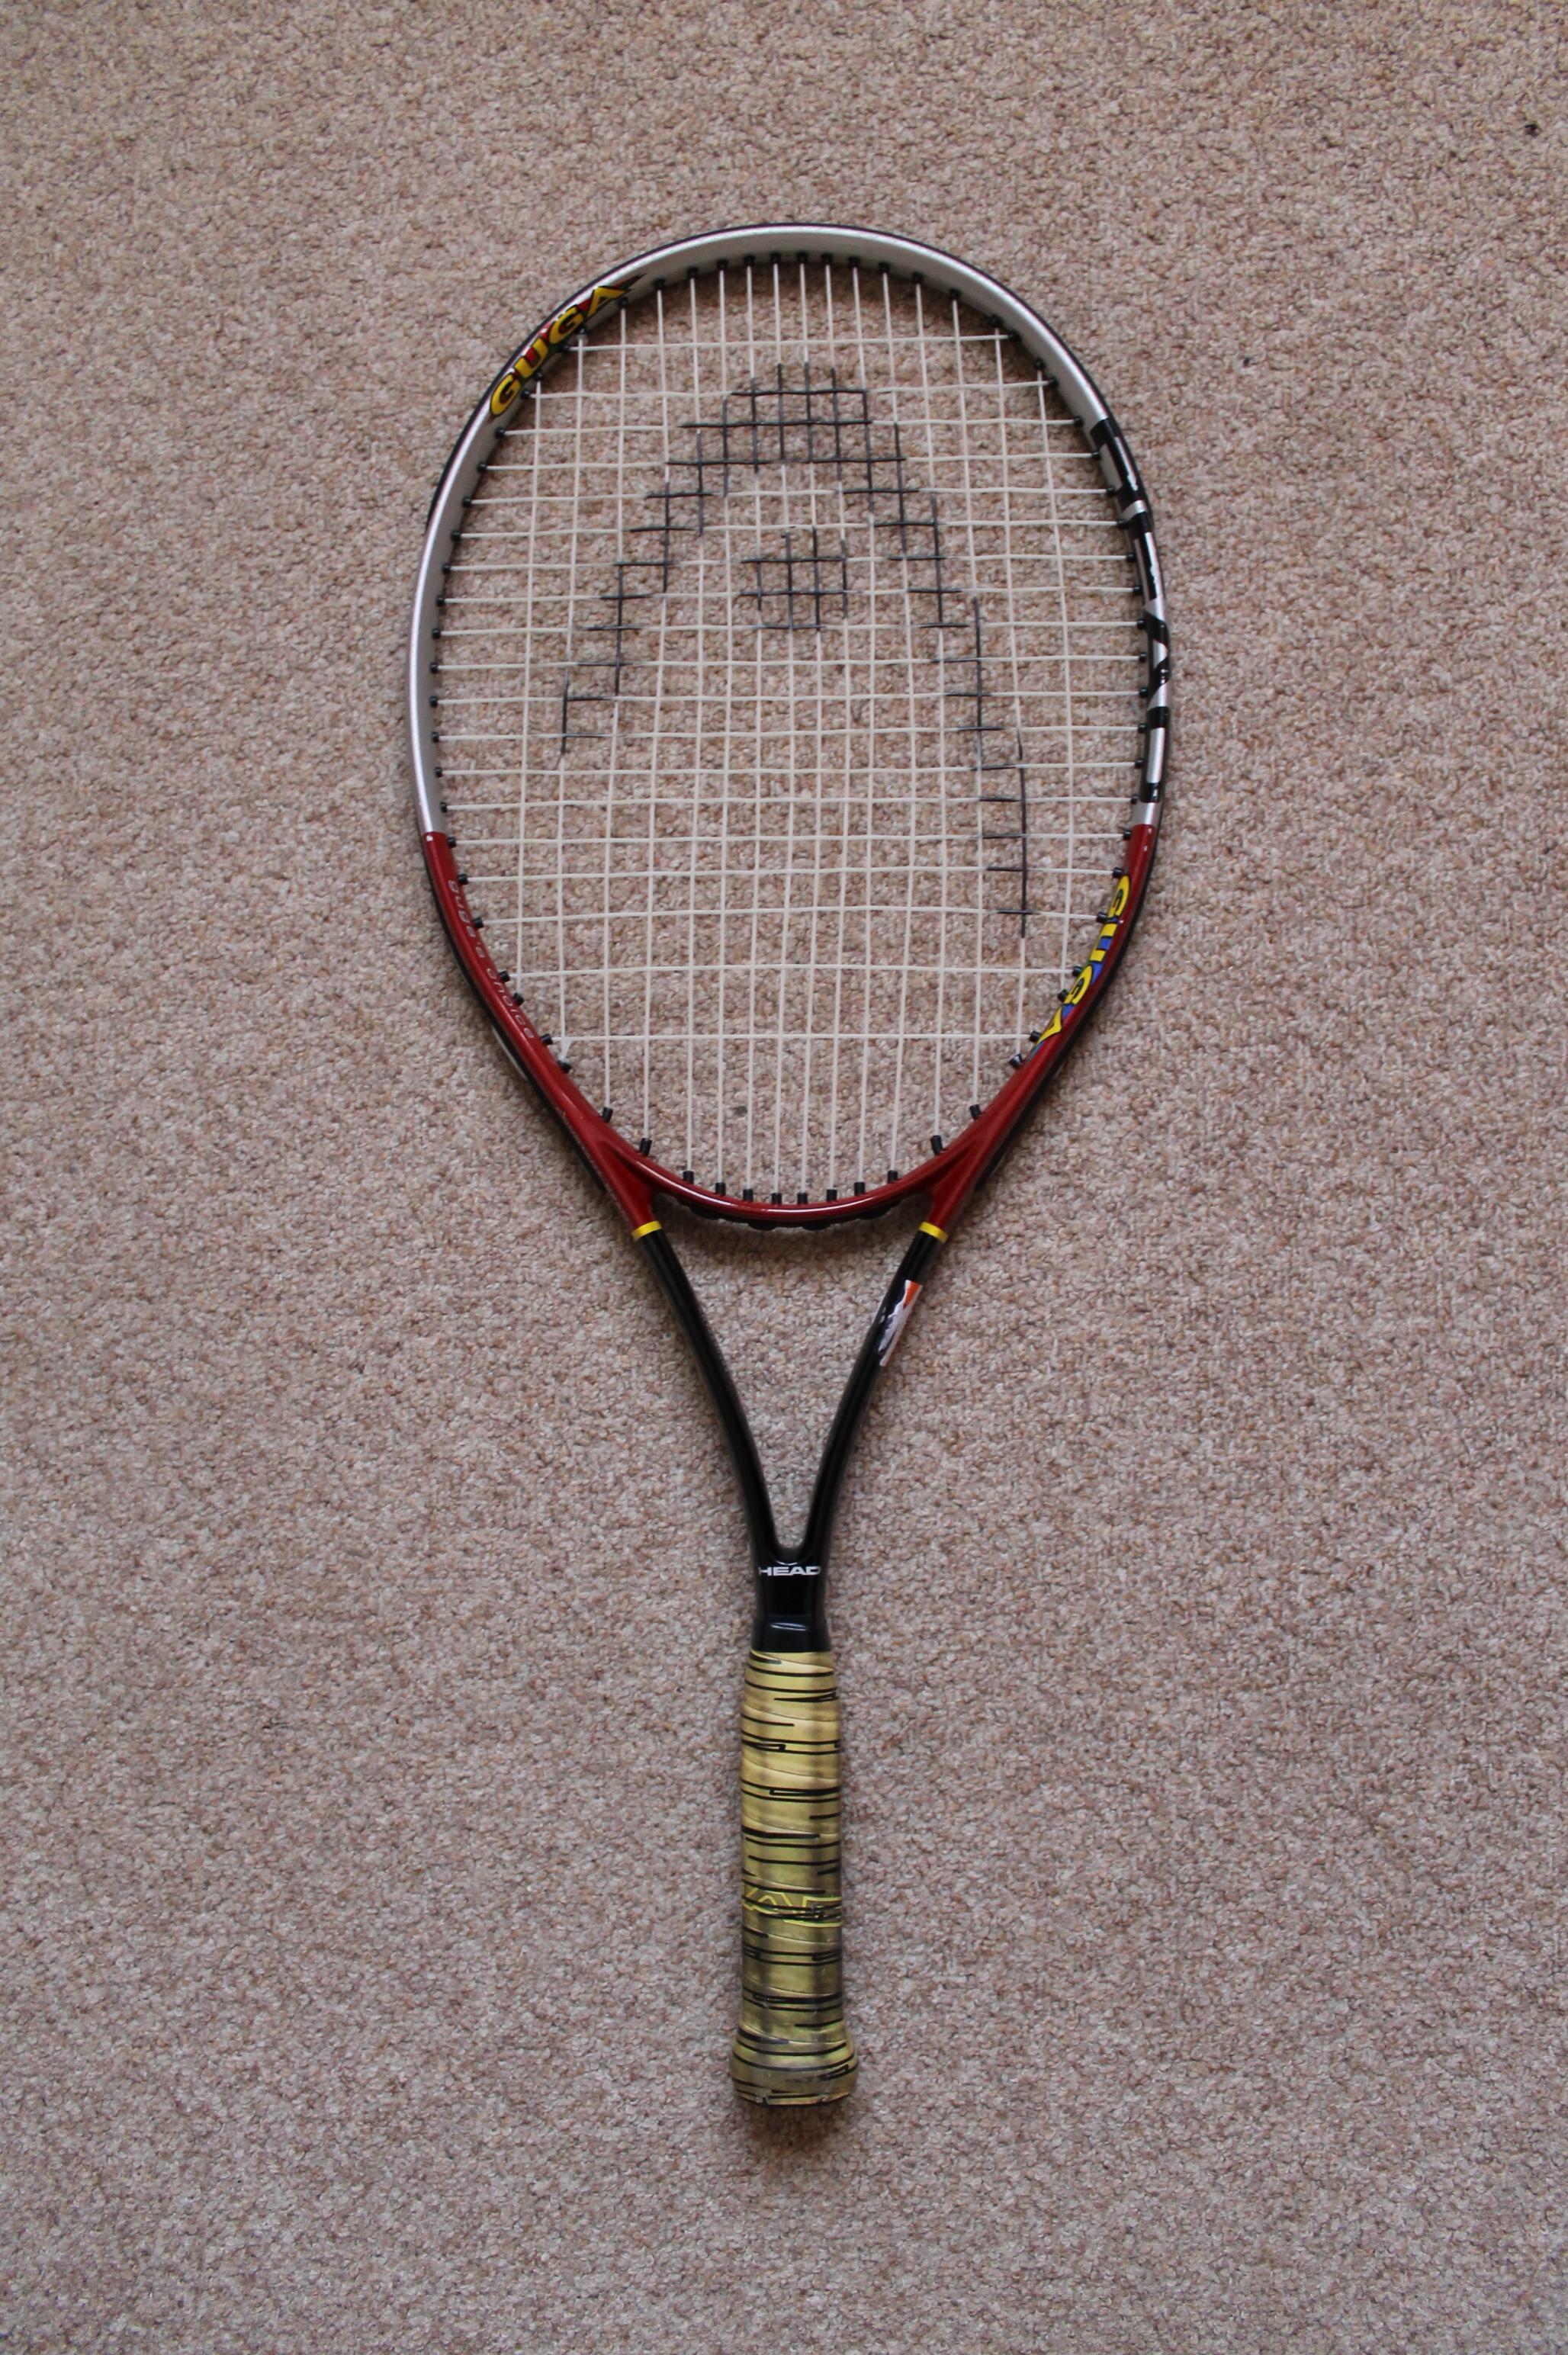 troc de troc raquette de tennis junior image 0